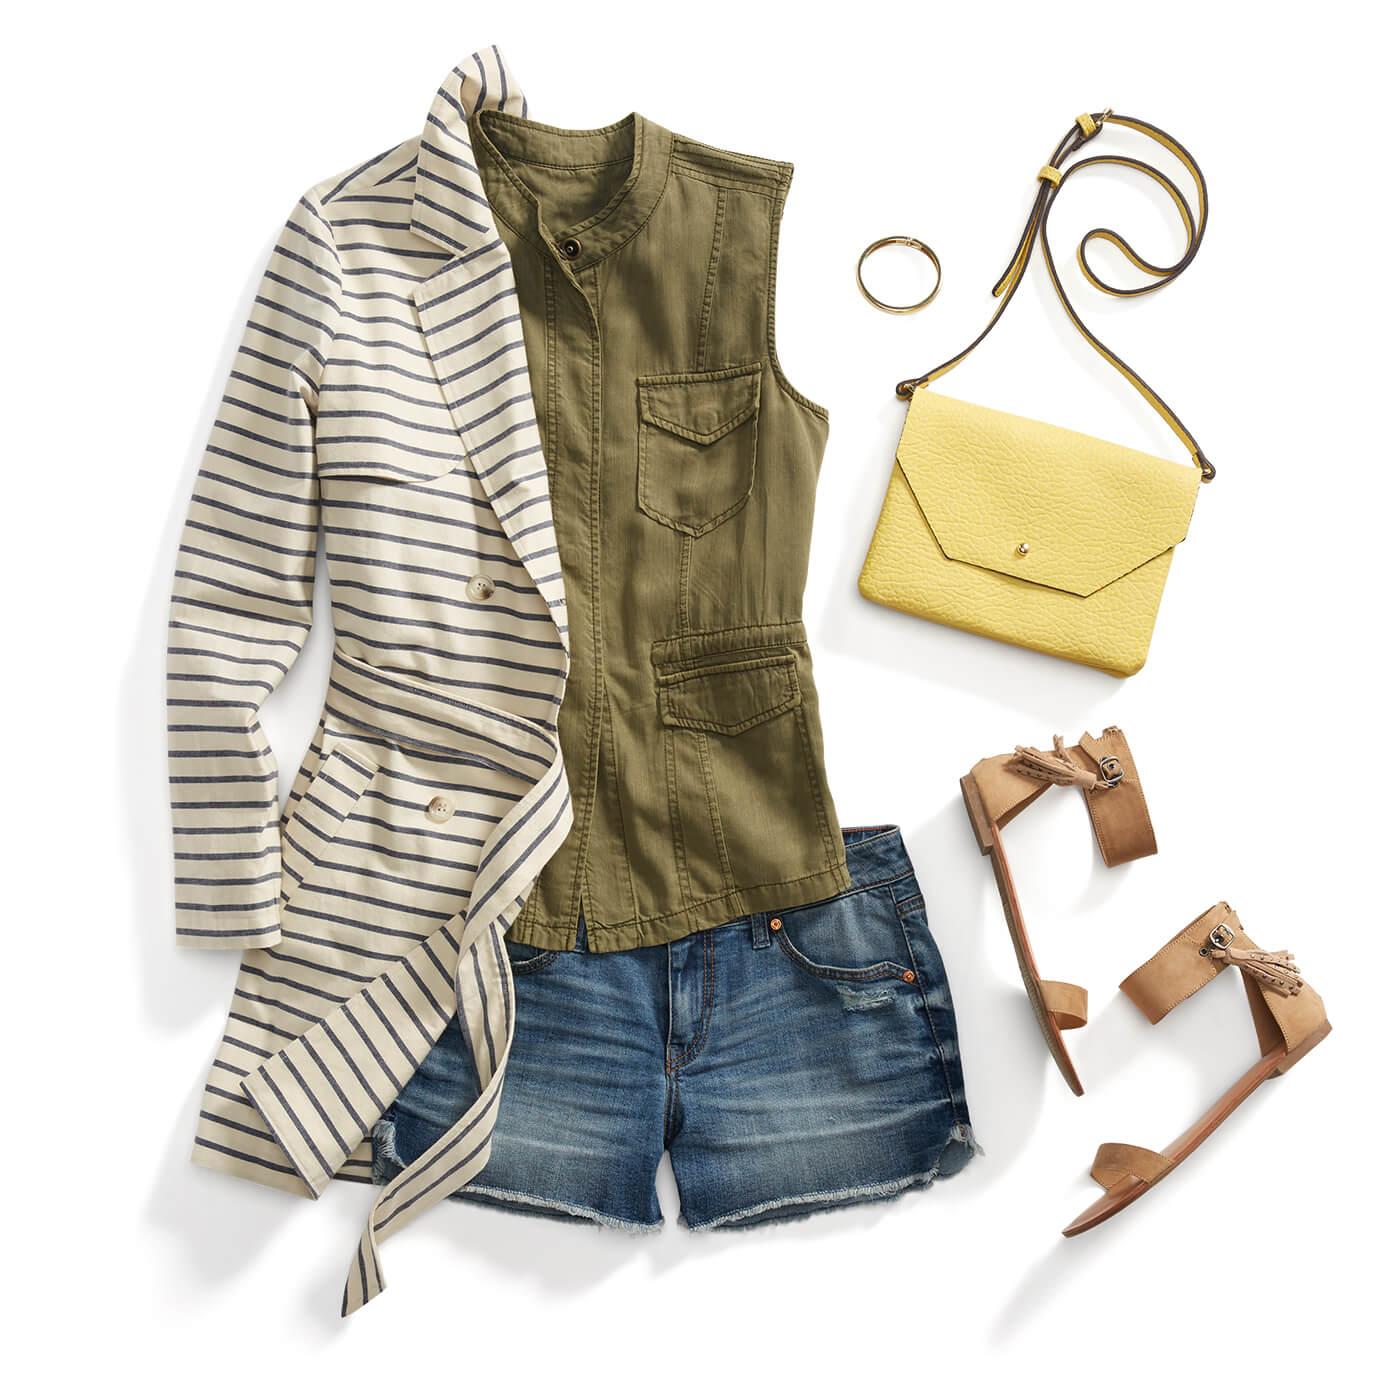 Style a Striped Jacket